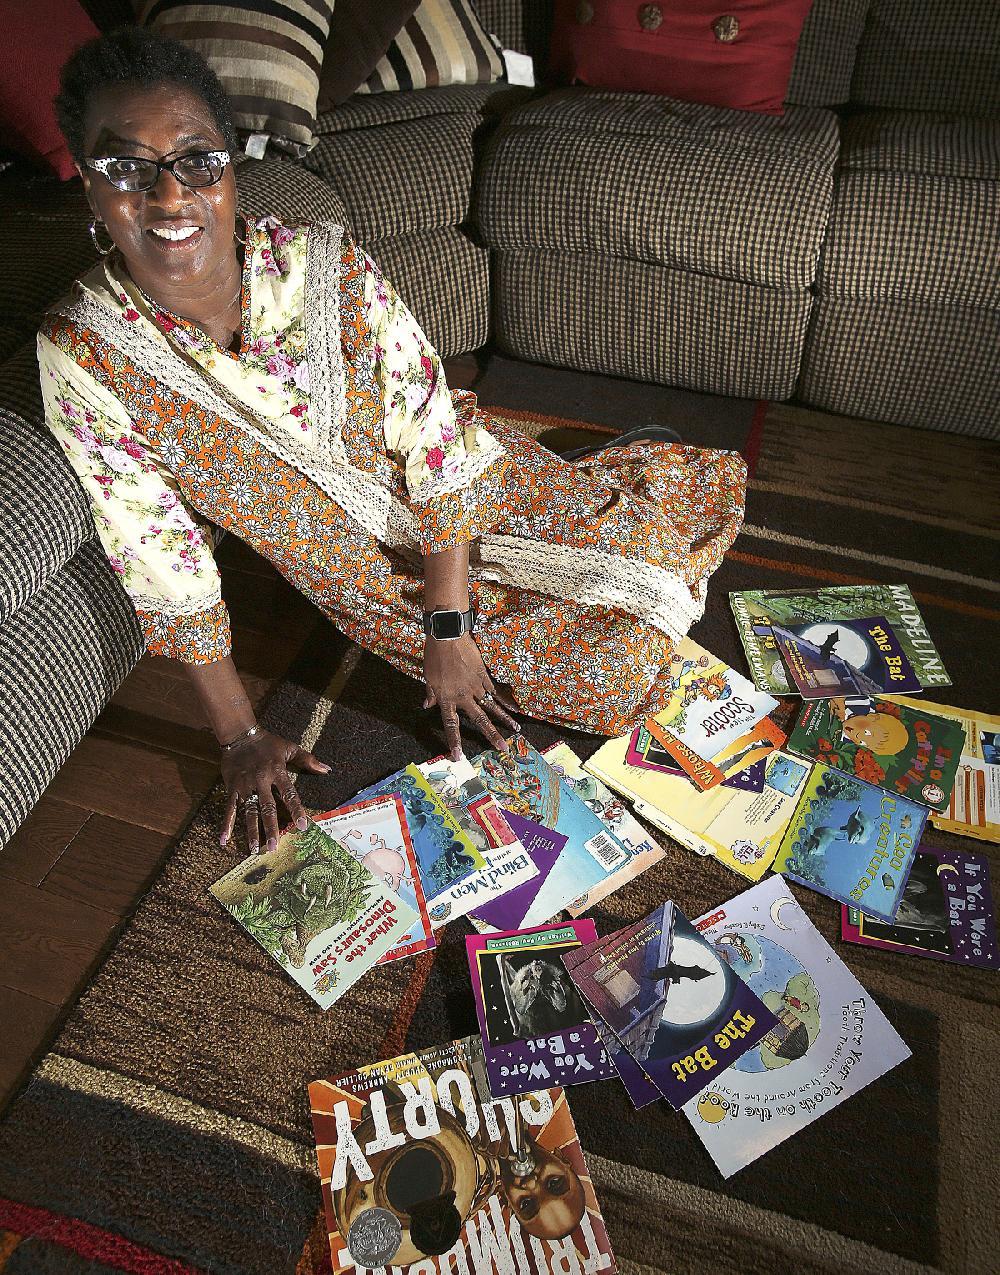 Tutor wants every kid to read, volunteers to make it happen